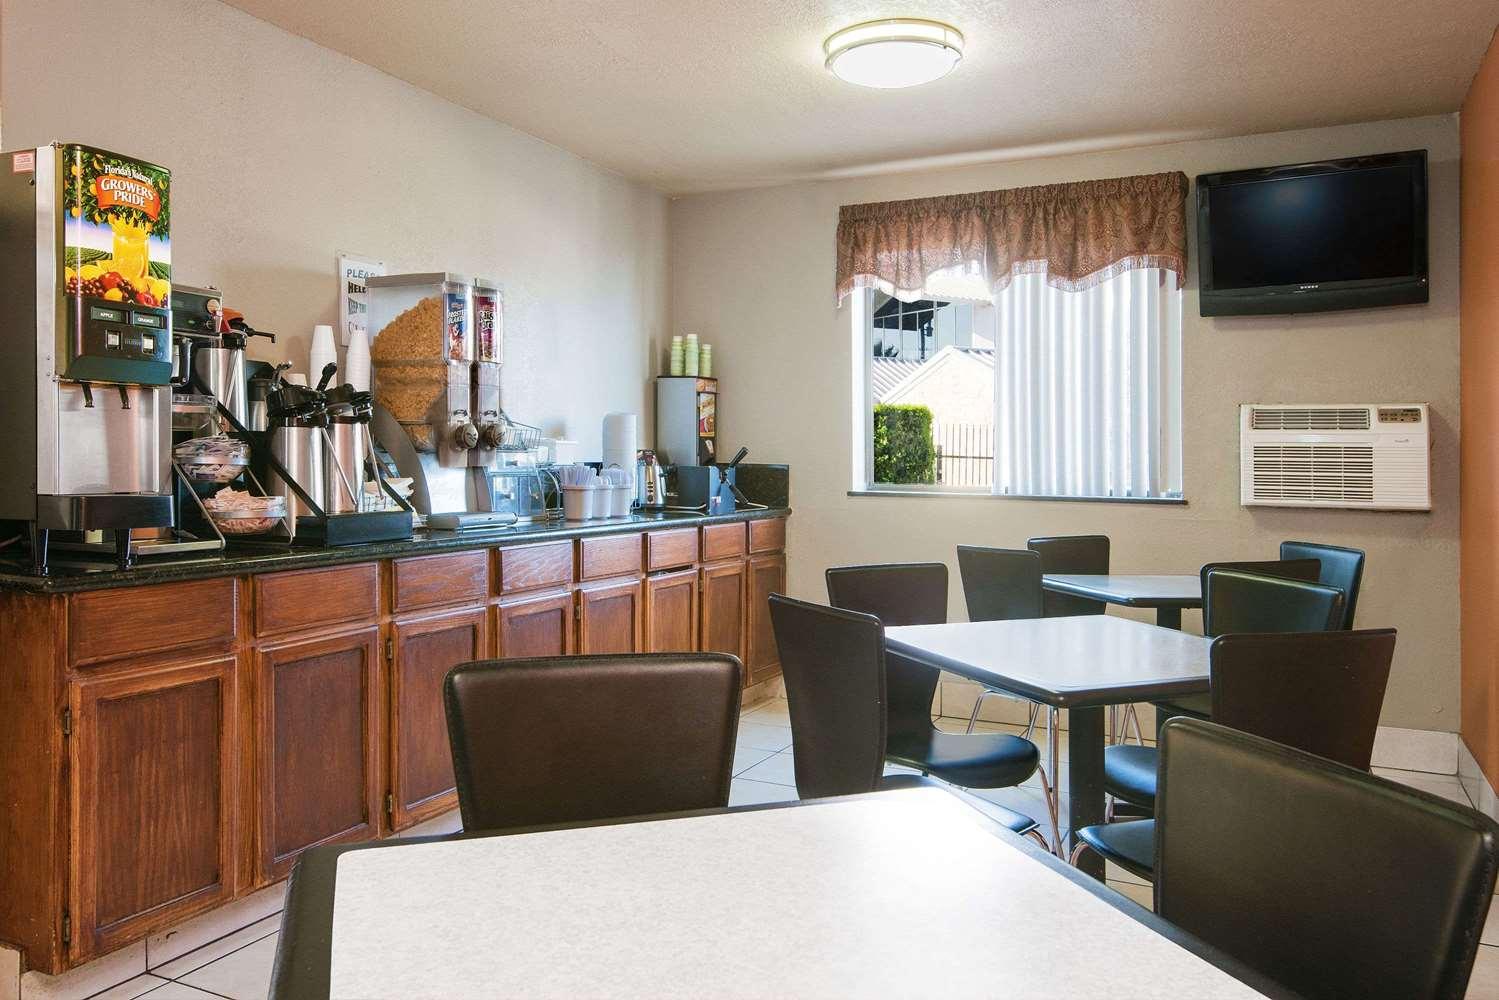 proam - Super 8 Hotel I-35 North San Antonio